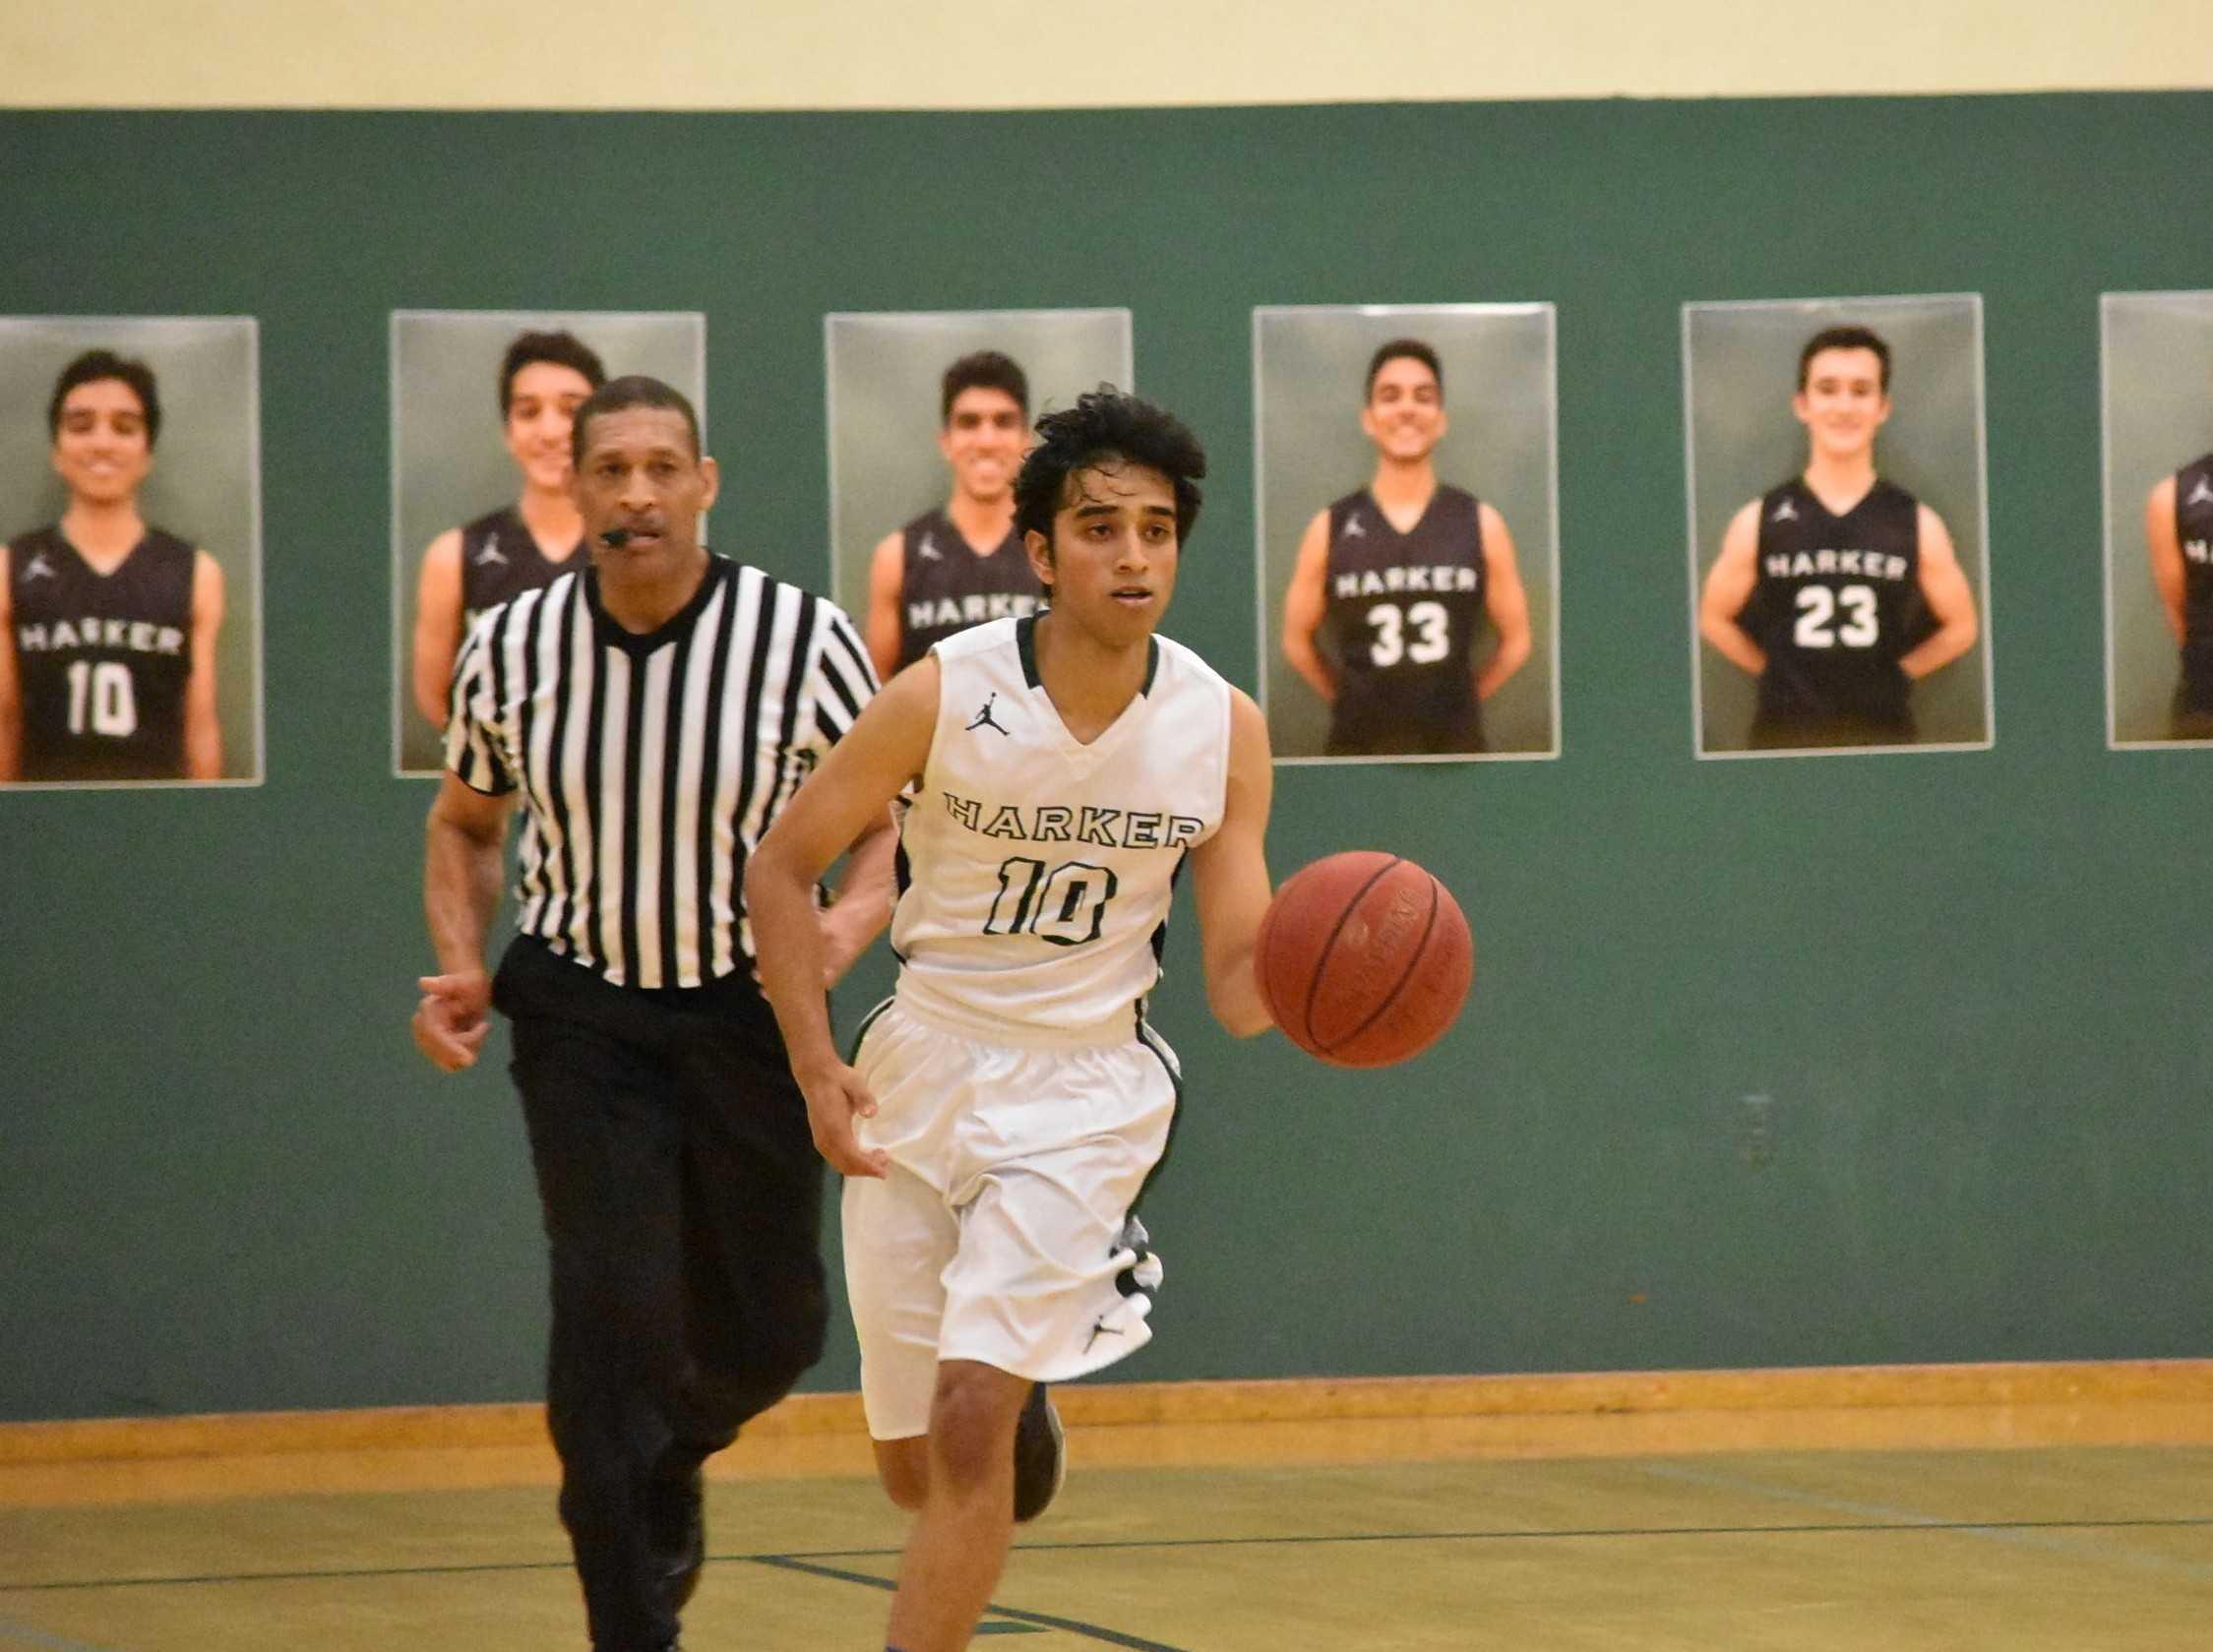 Team co-captain Rohan Desikan (12) runs with the ball. Rohan was one of 14 seniors honored at the joint varsity boys basketball-cheerleading senior night on Feb. 19.